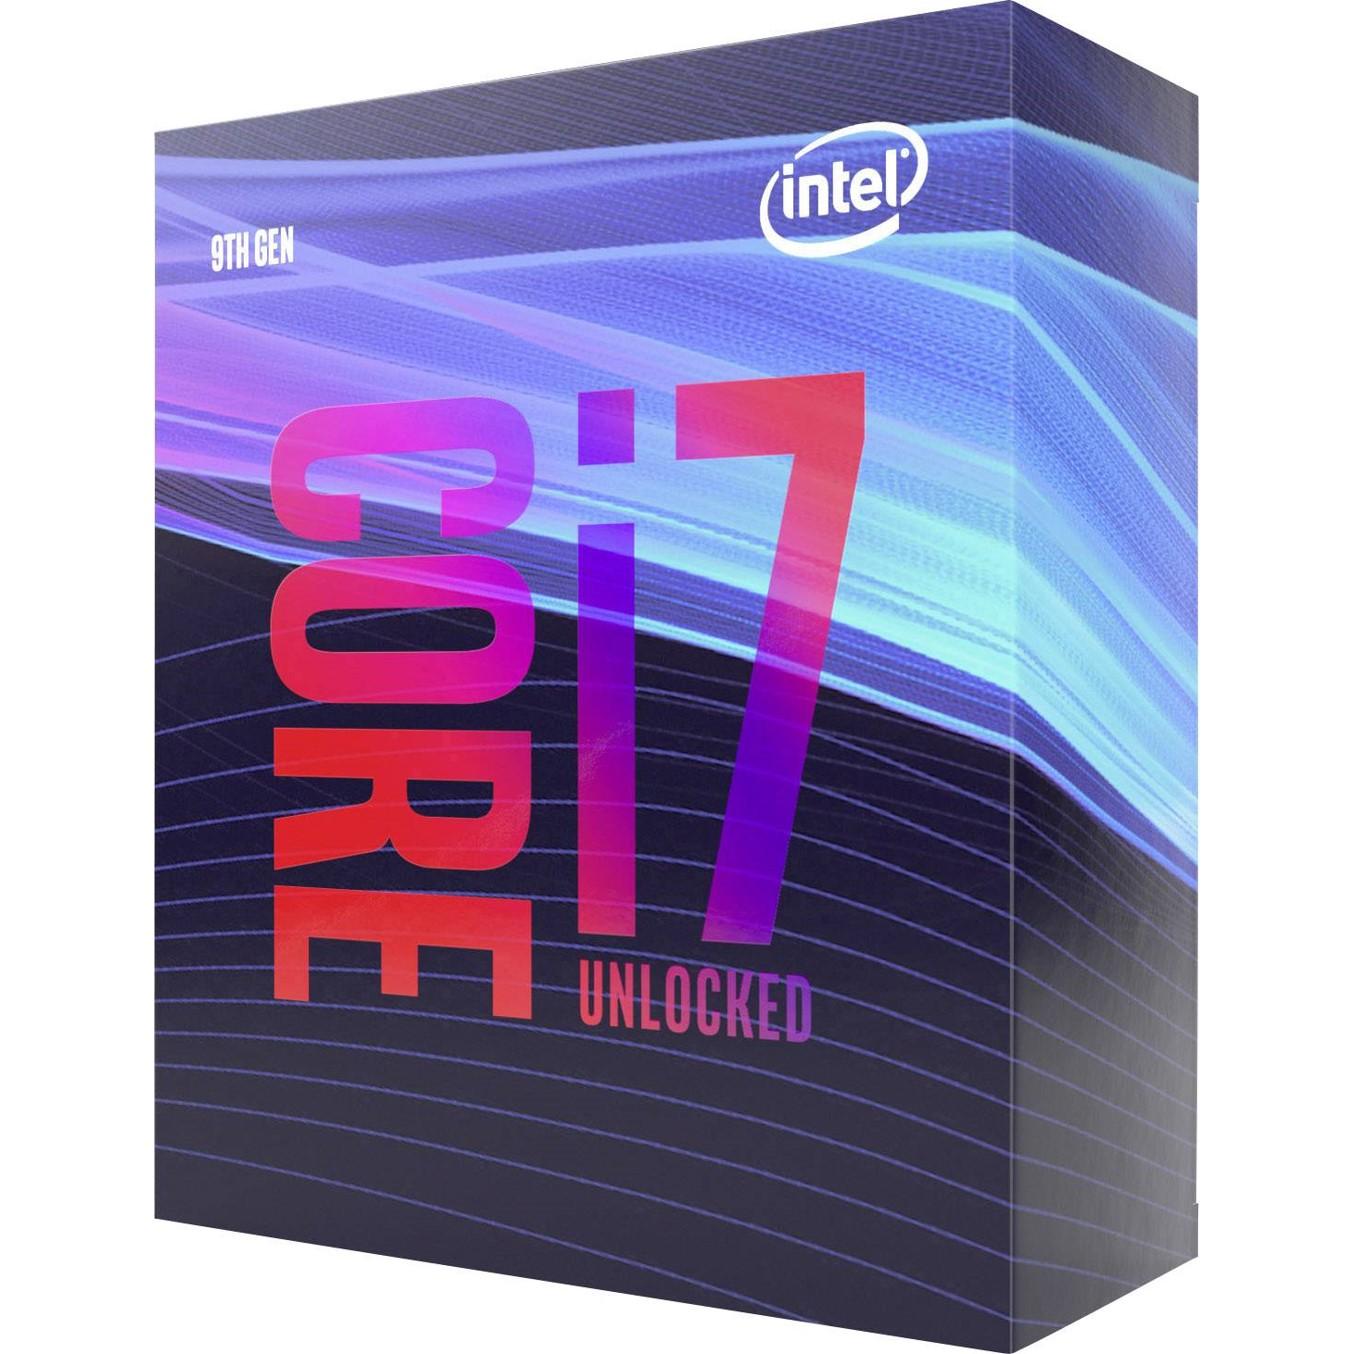 MICRO. INTEL I7 9700K 9é GENERACIÓN LGA 1151 8